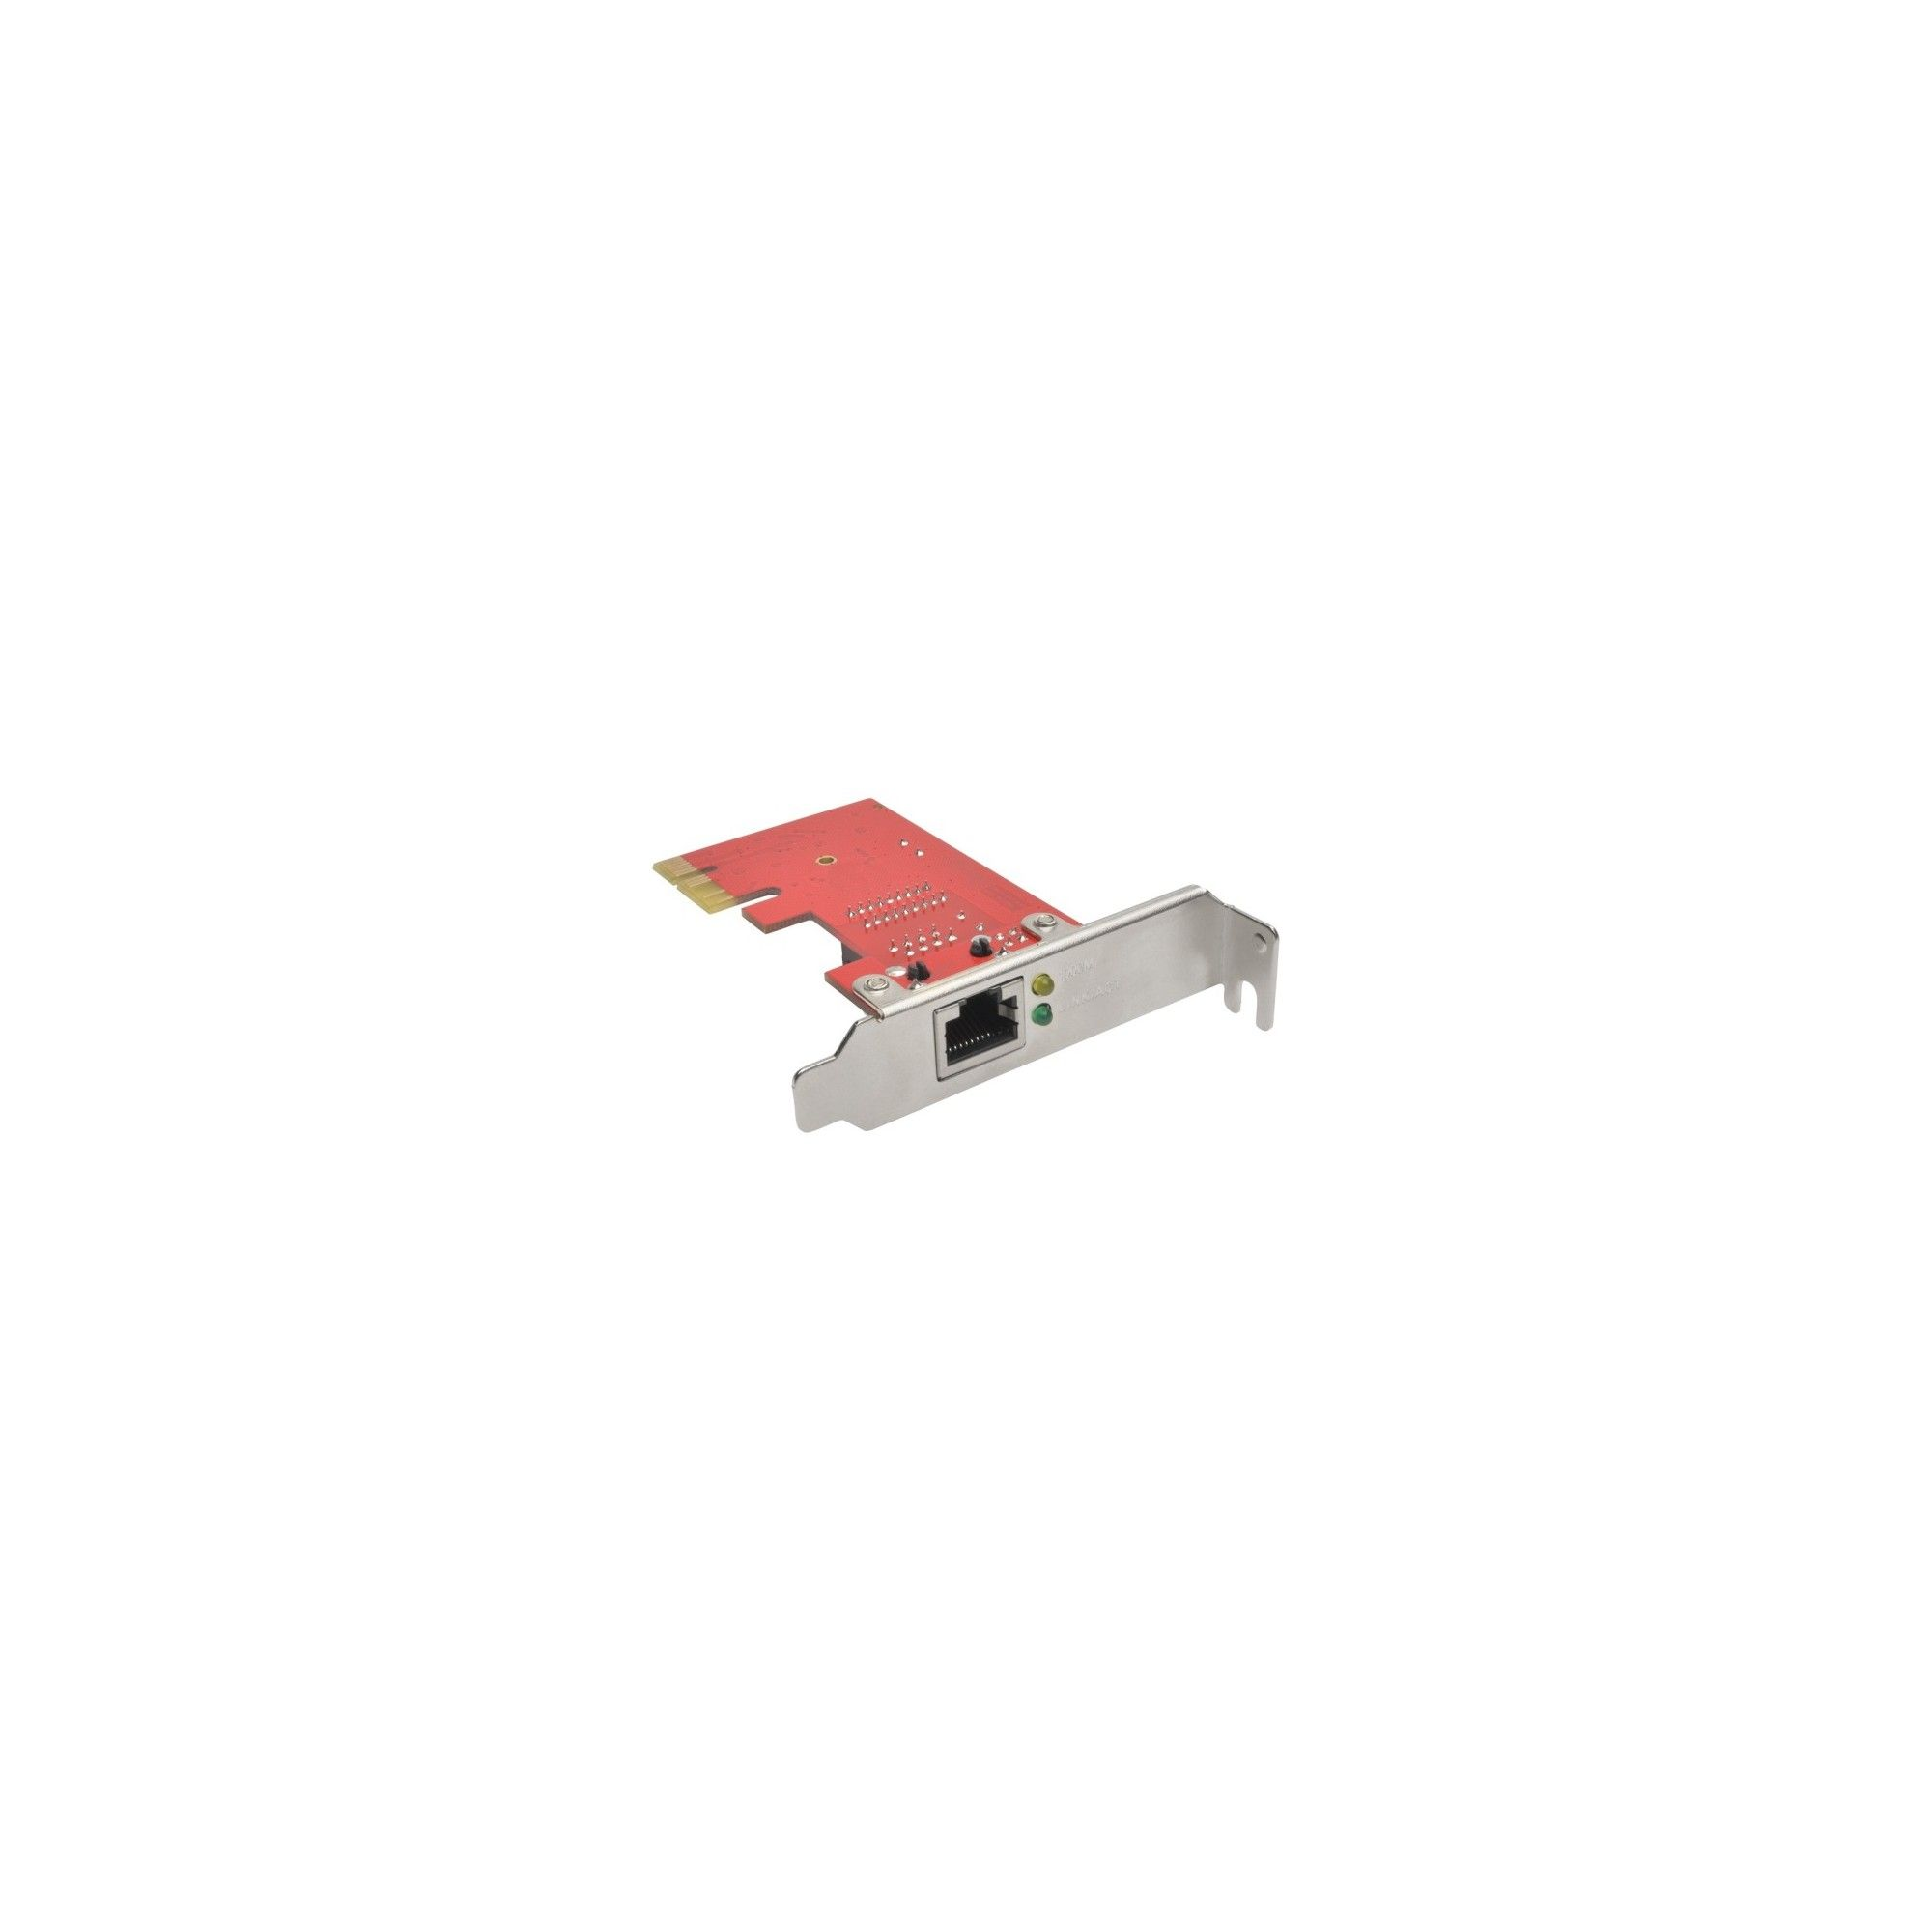 Tripp Lite 1-Port Gigabit Ethernet (GbE) PCI Express (PCIe